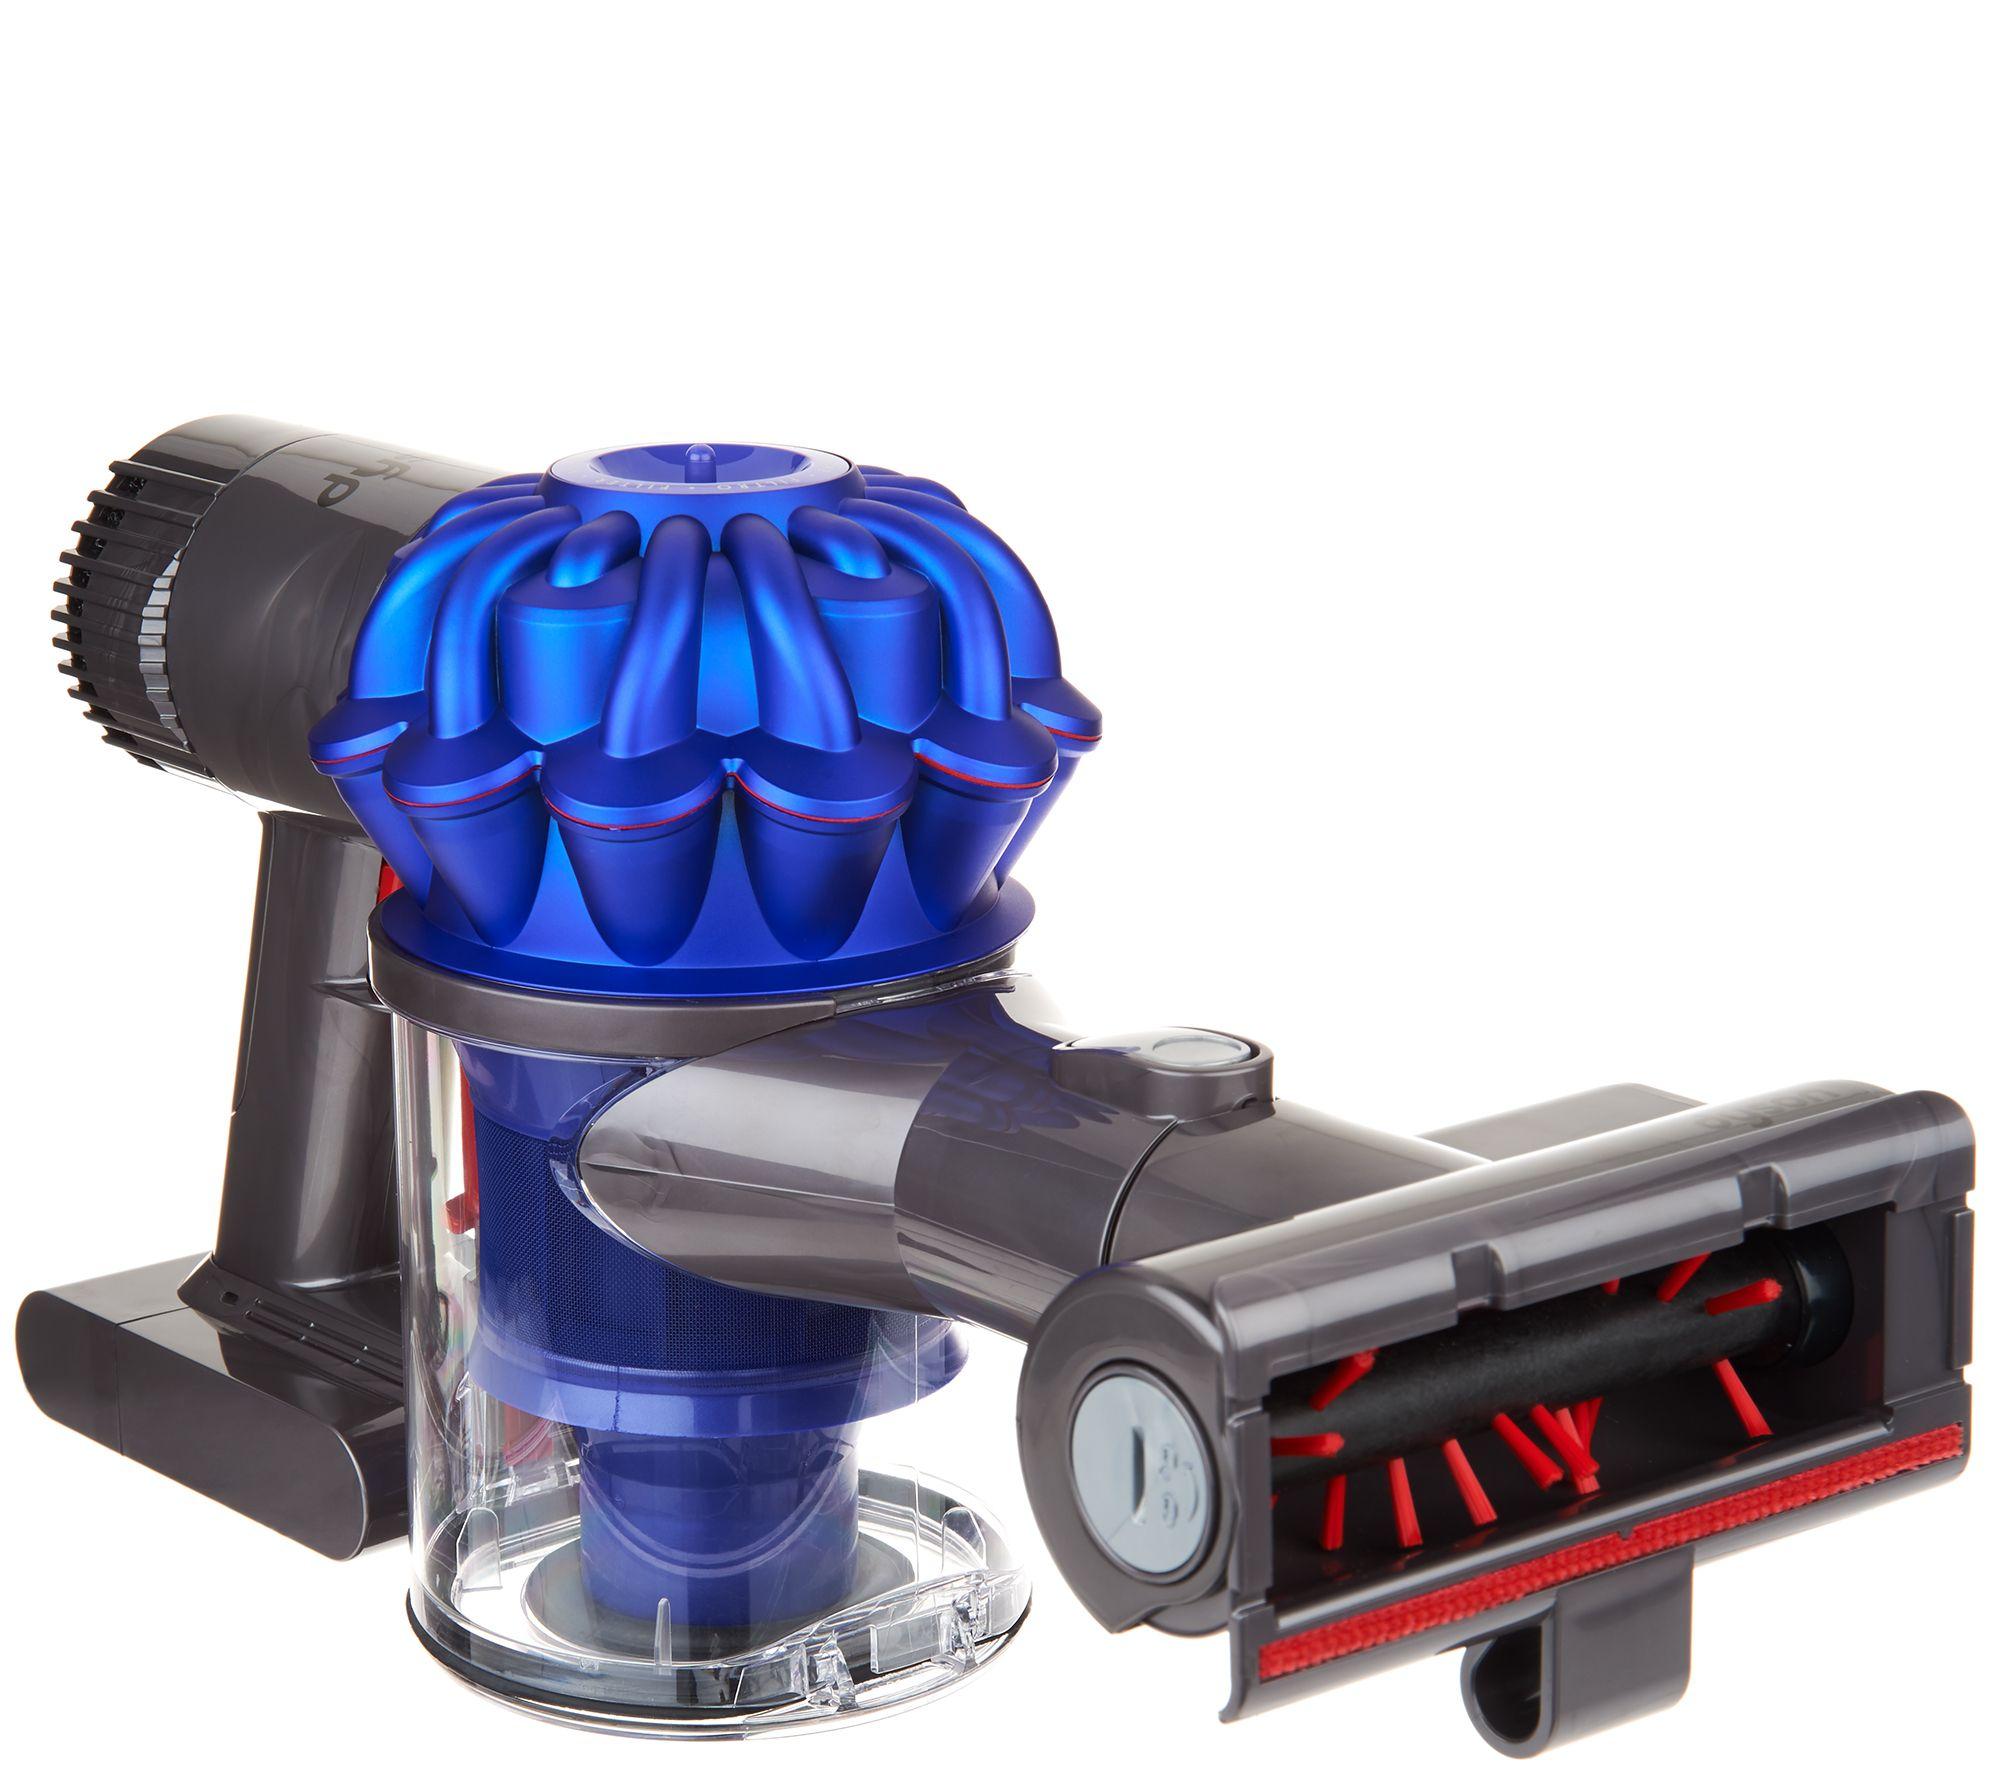 dyson v6 trigger animal handheld vacuum with 3 tool attachments page 1 u2014 qvccom - Dyson Handheld Vacuum